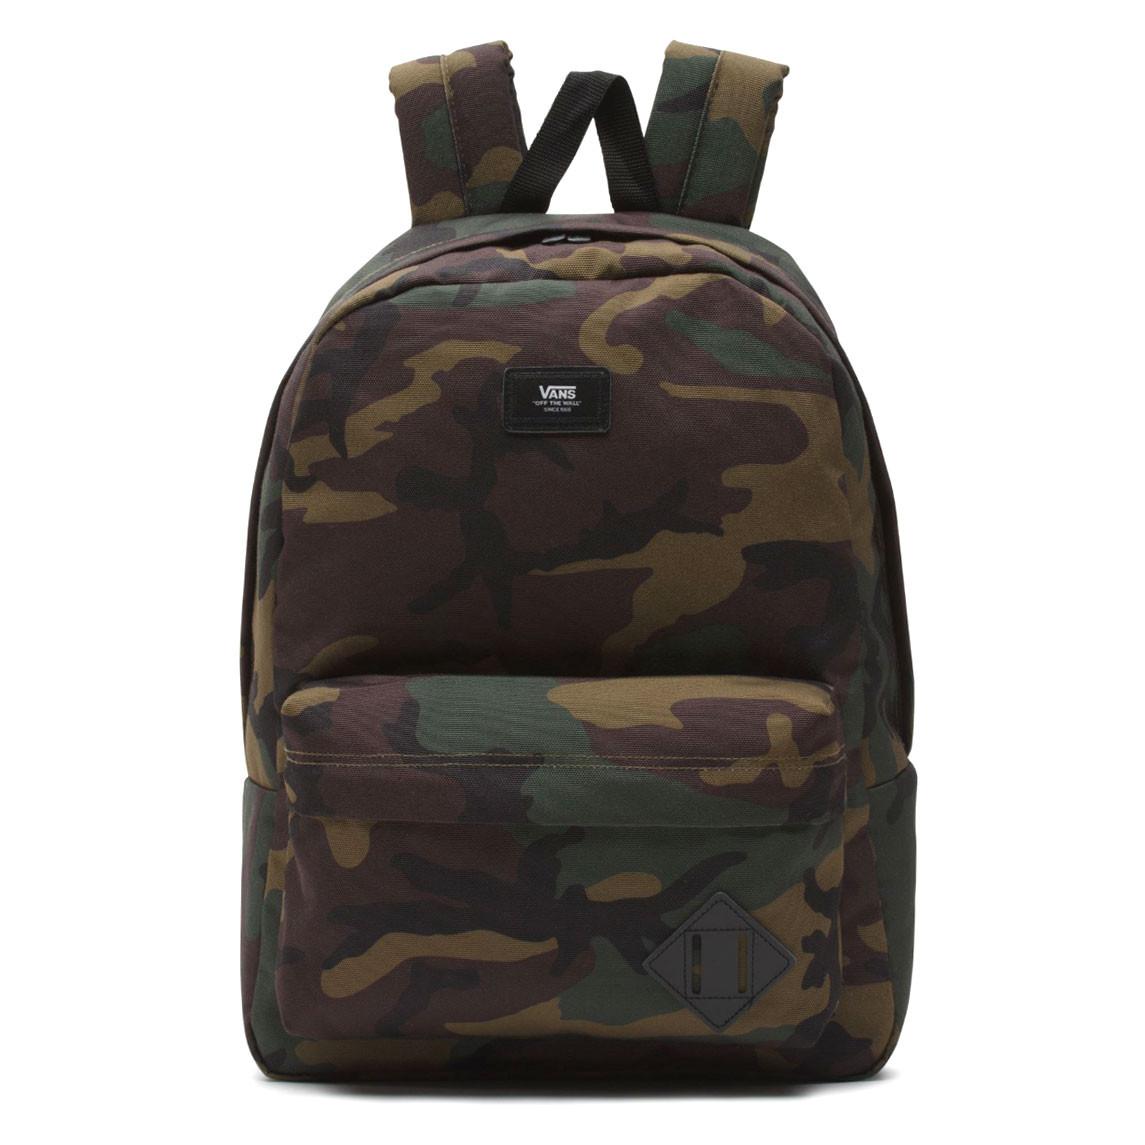 8eb8fa4659b Backpack Vans Old Skool II classic camo/black | Snowboard Zezula